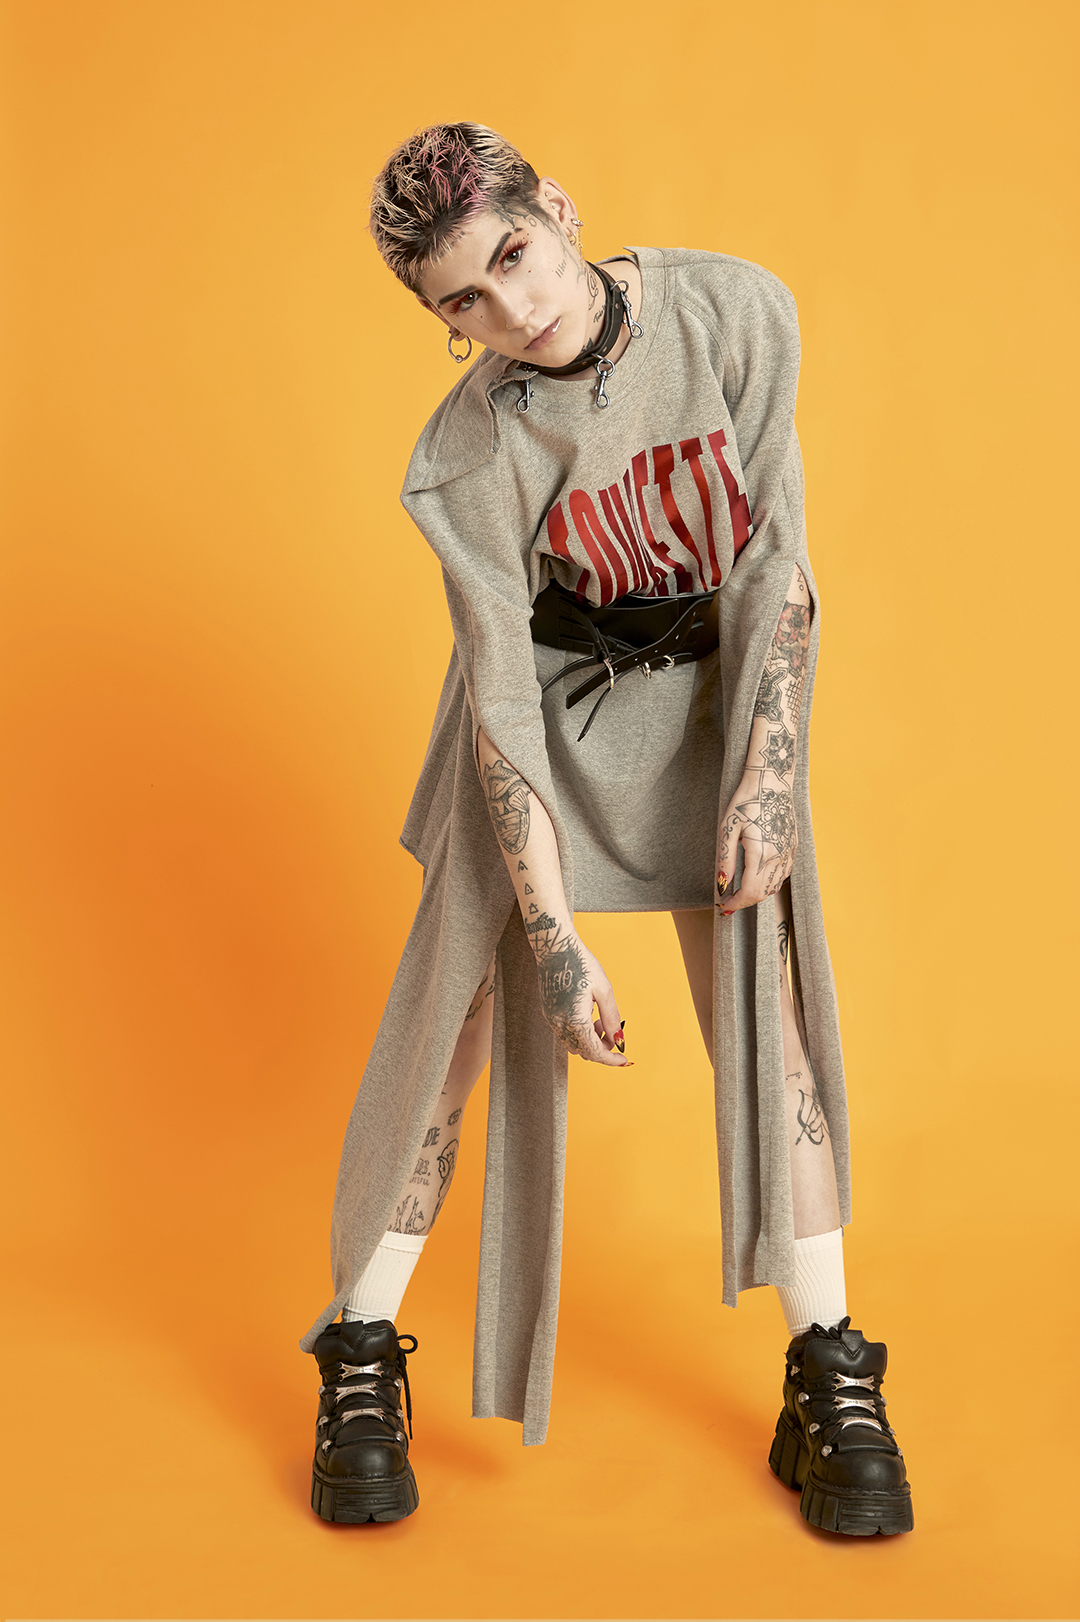 Vestido BRAIN & BEAST / cinturón STRADIVARIUS / calcetines TUSET / botas NEW ROCK